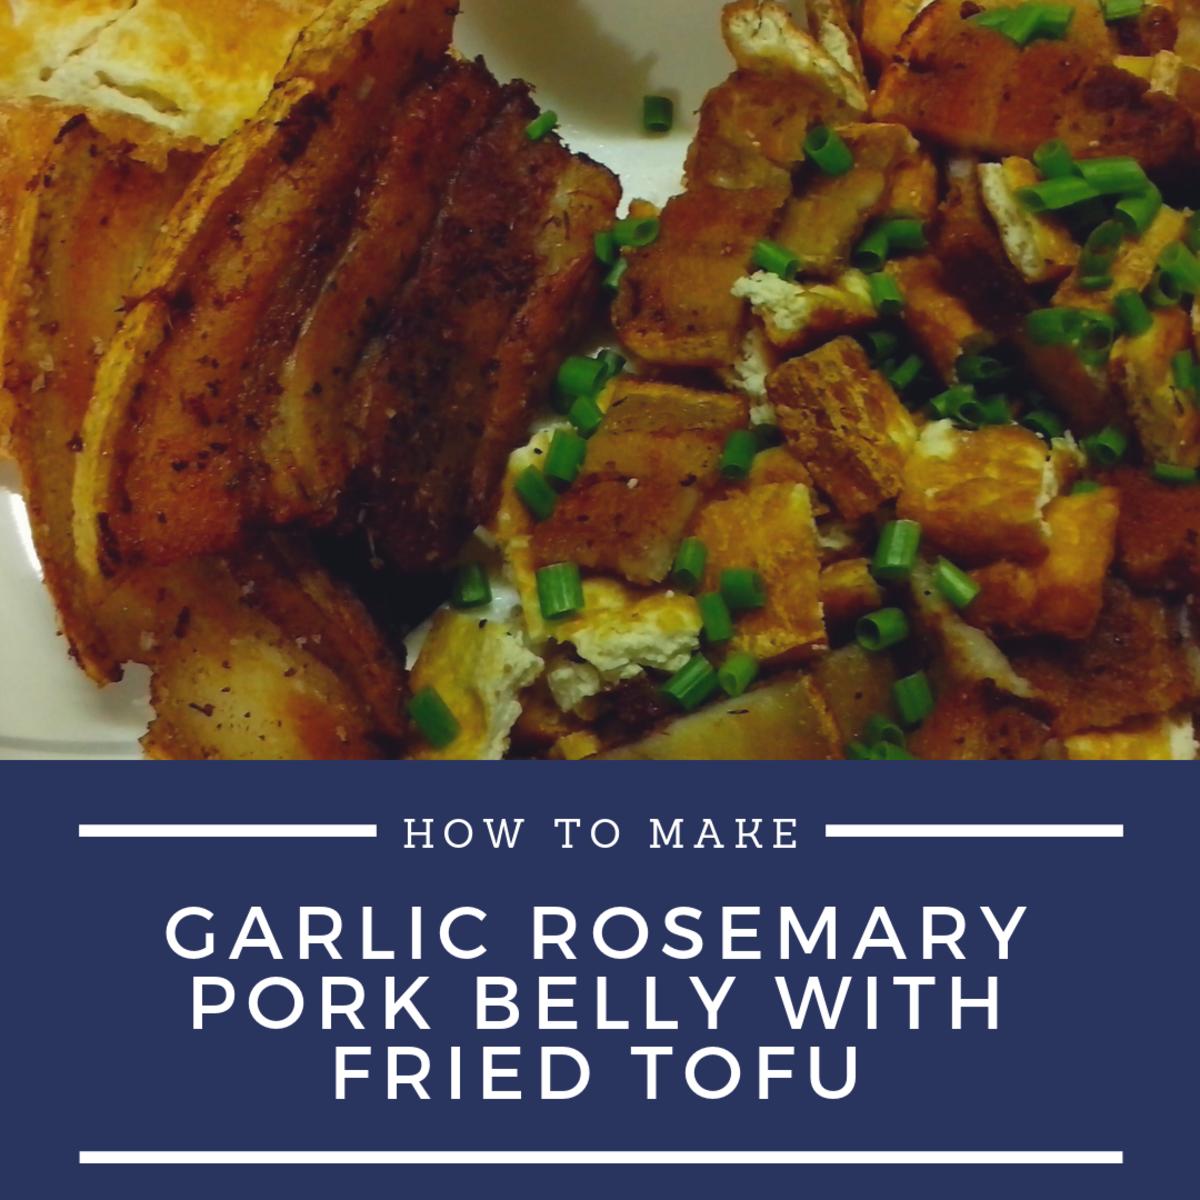 Garlic rosemary pork belly with fried tofu